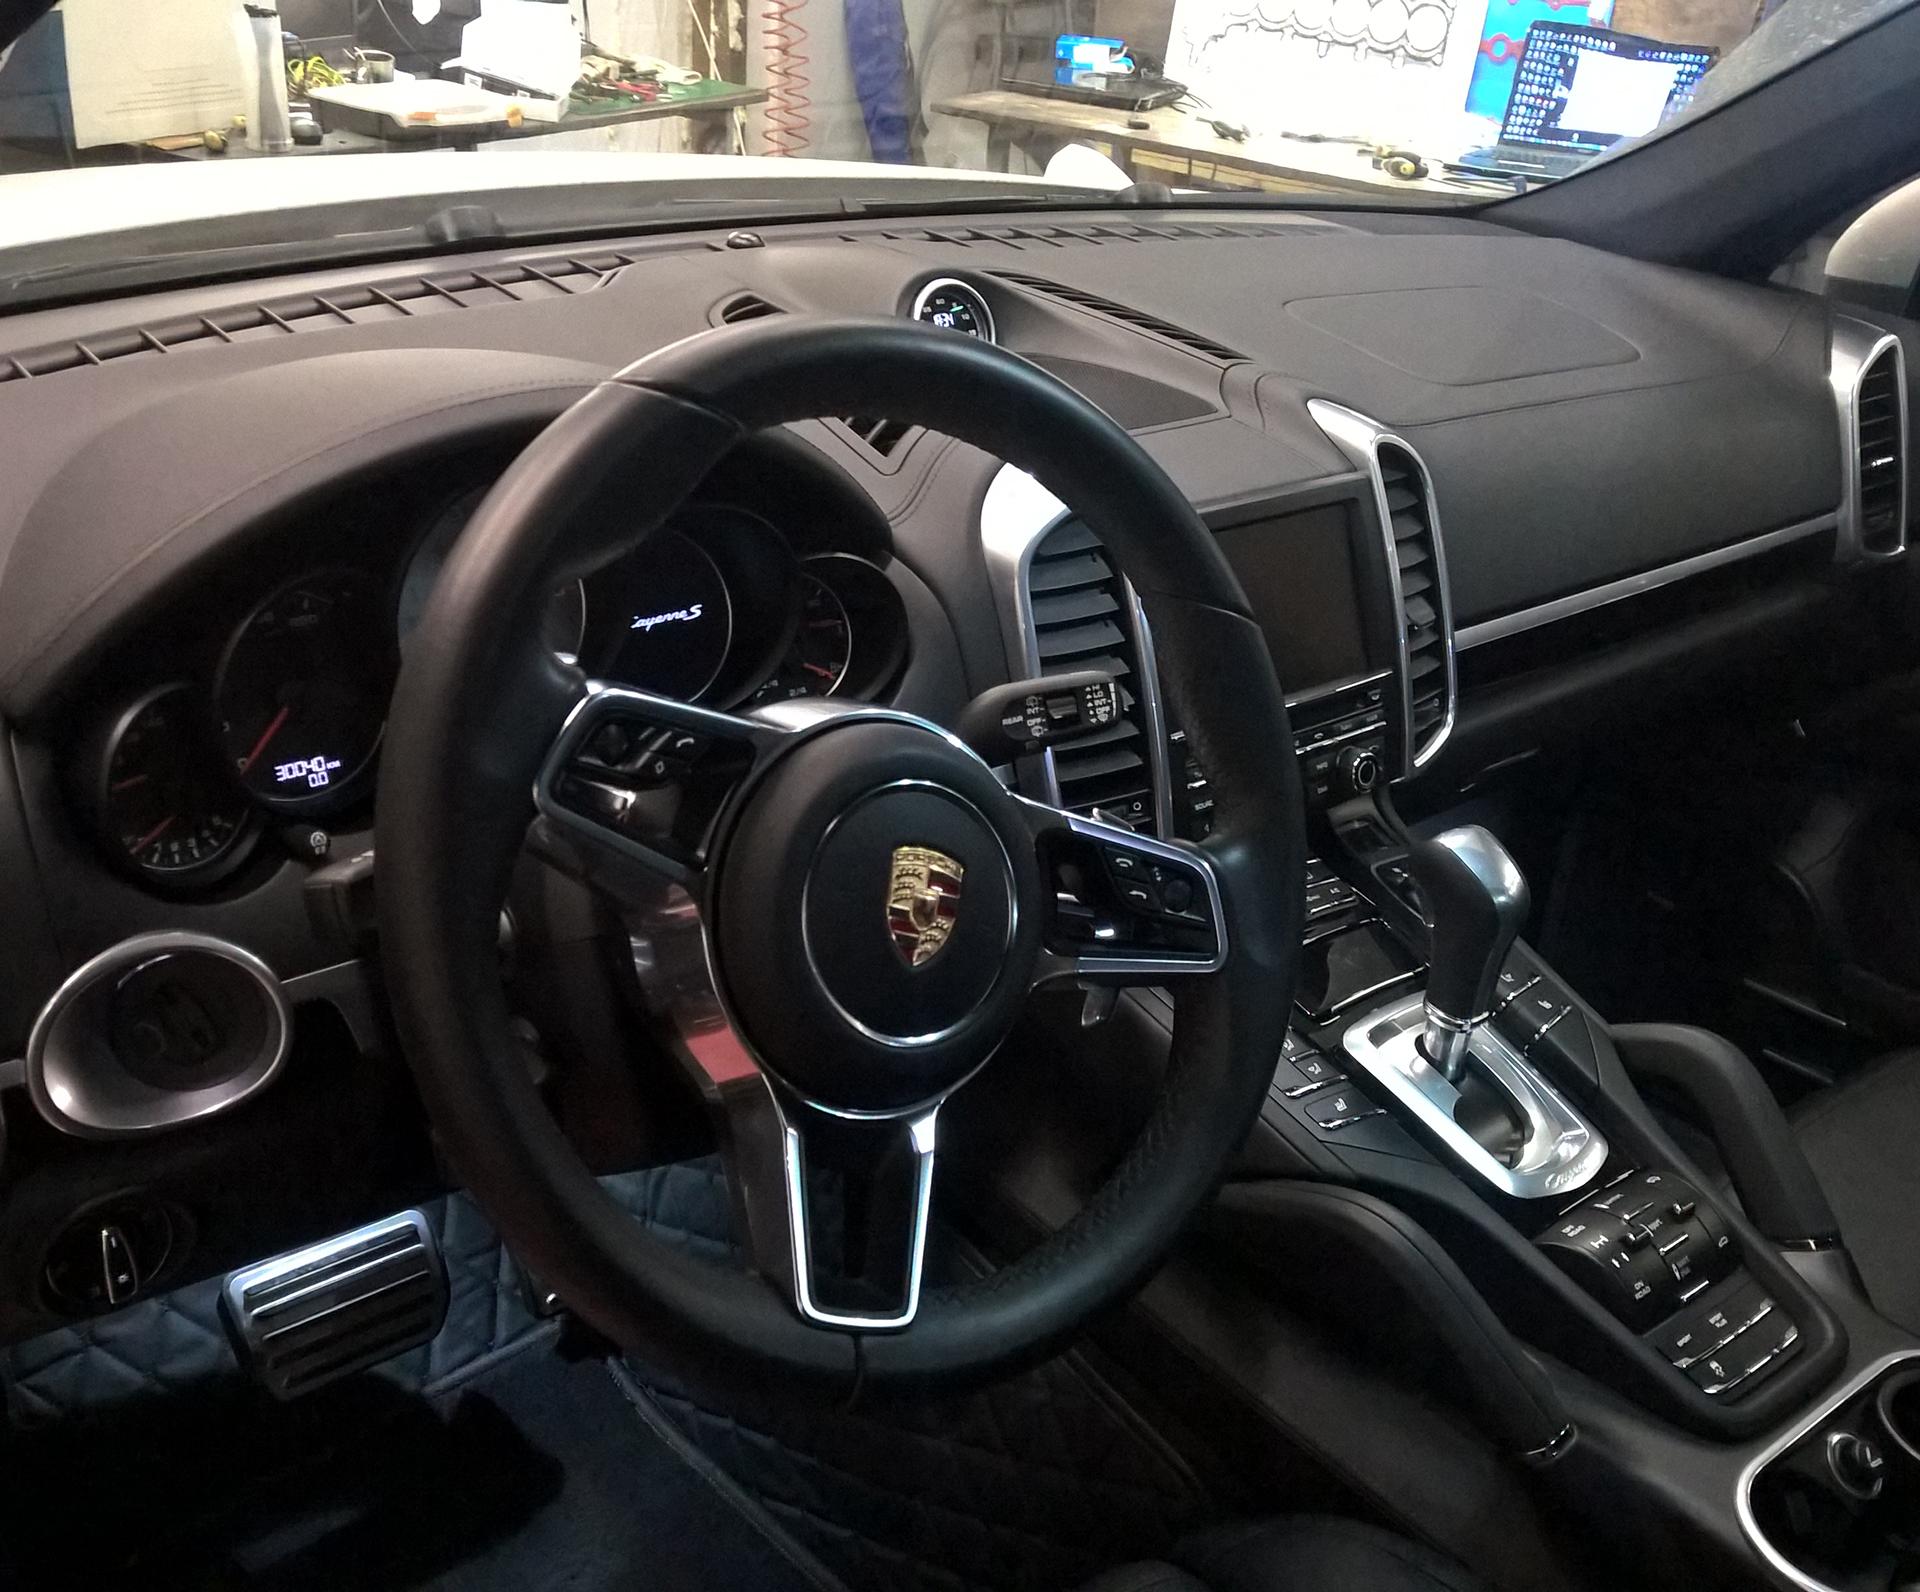 Процесс модернизации Porsche Cayenne 958 4.2 TDI